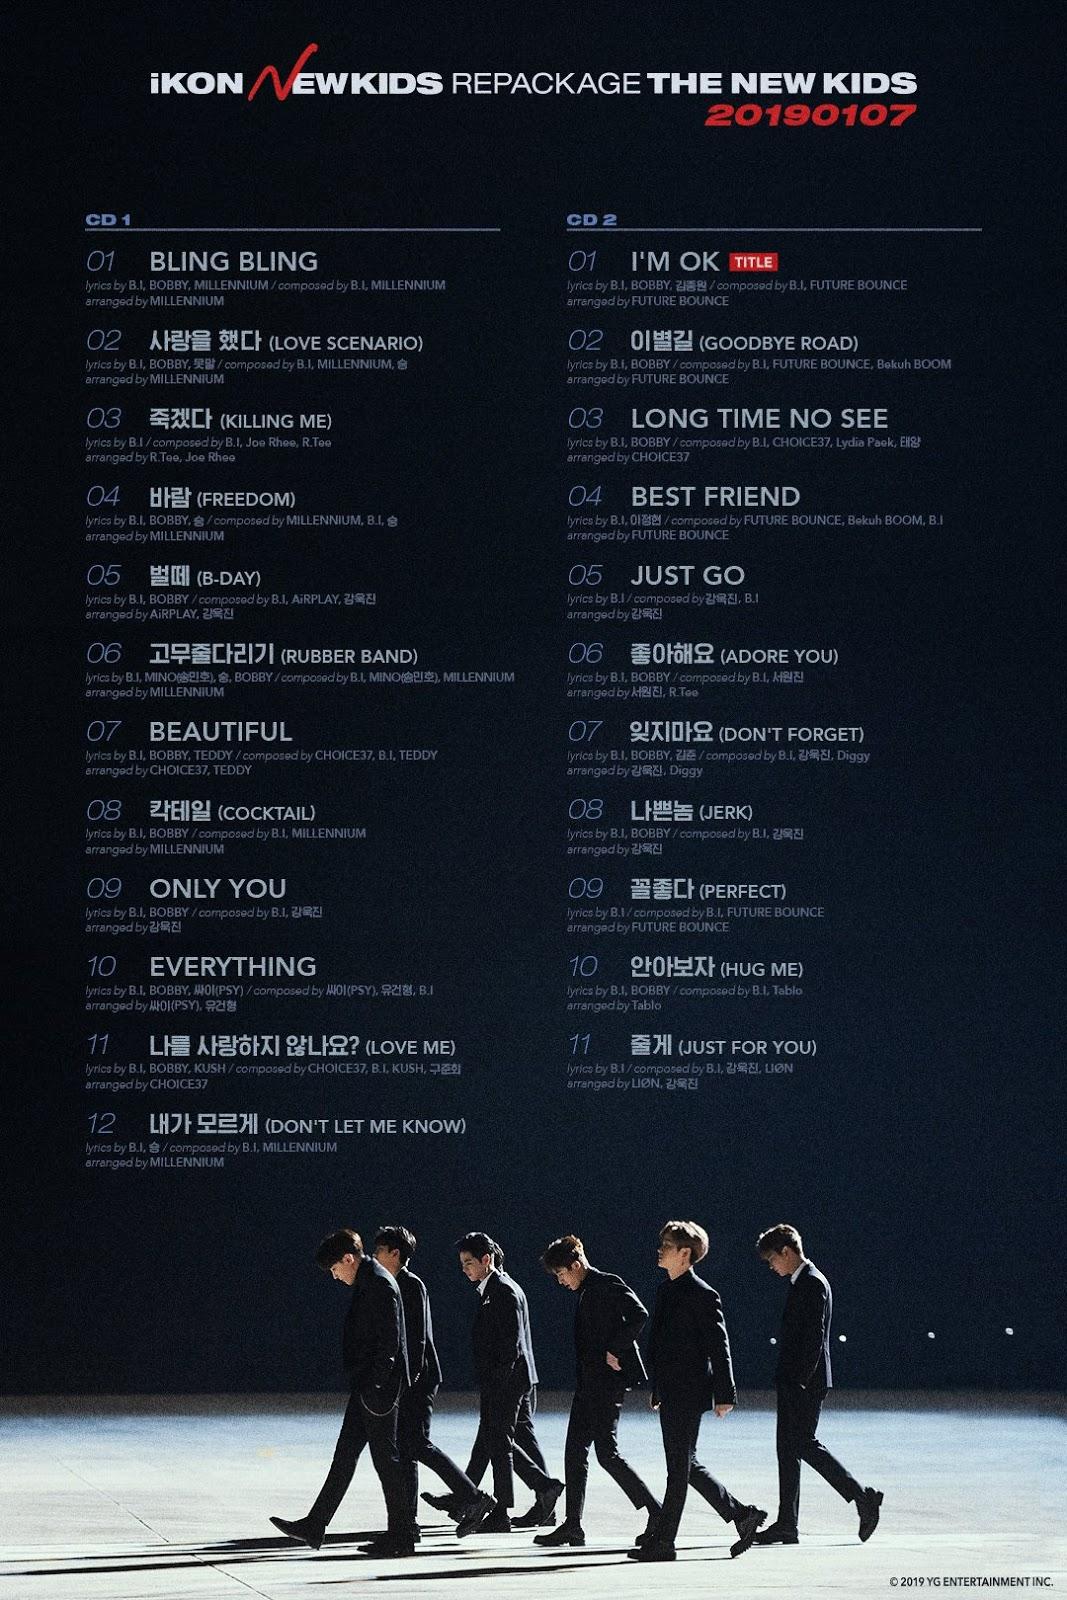 iKON New Kids Repackaged Album Track Lists - iKON Updates